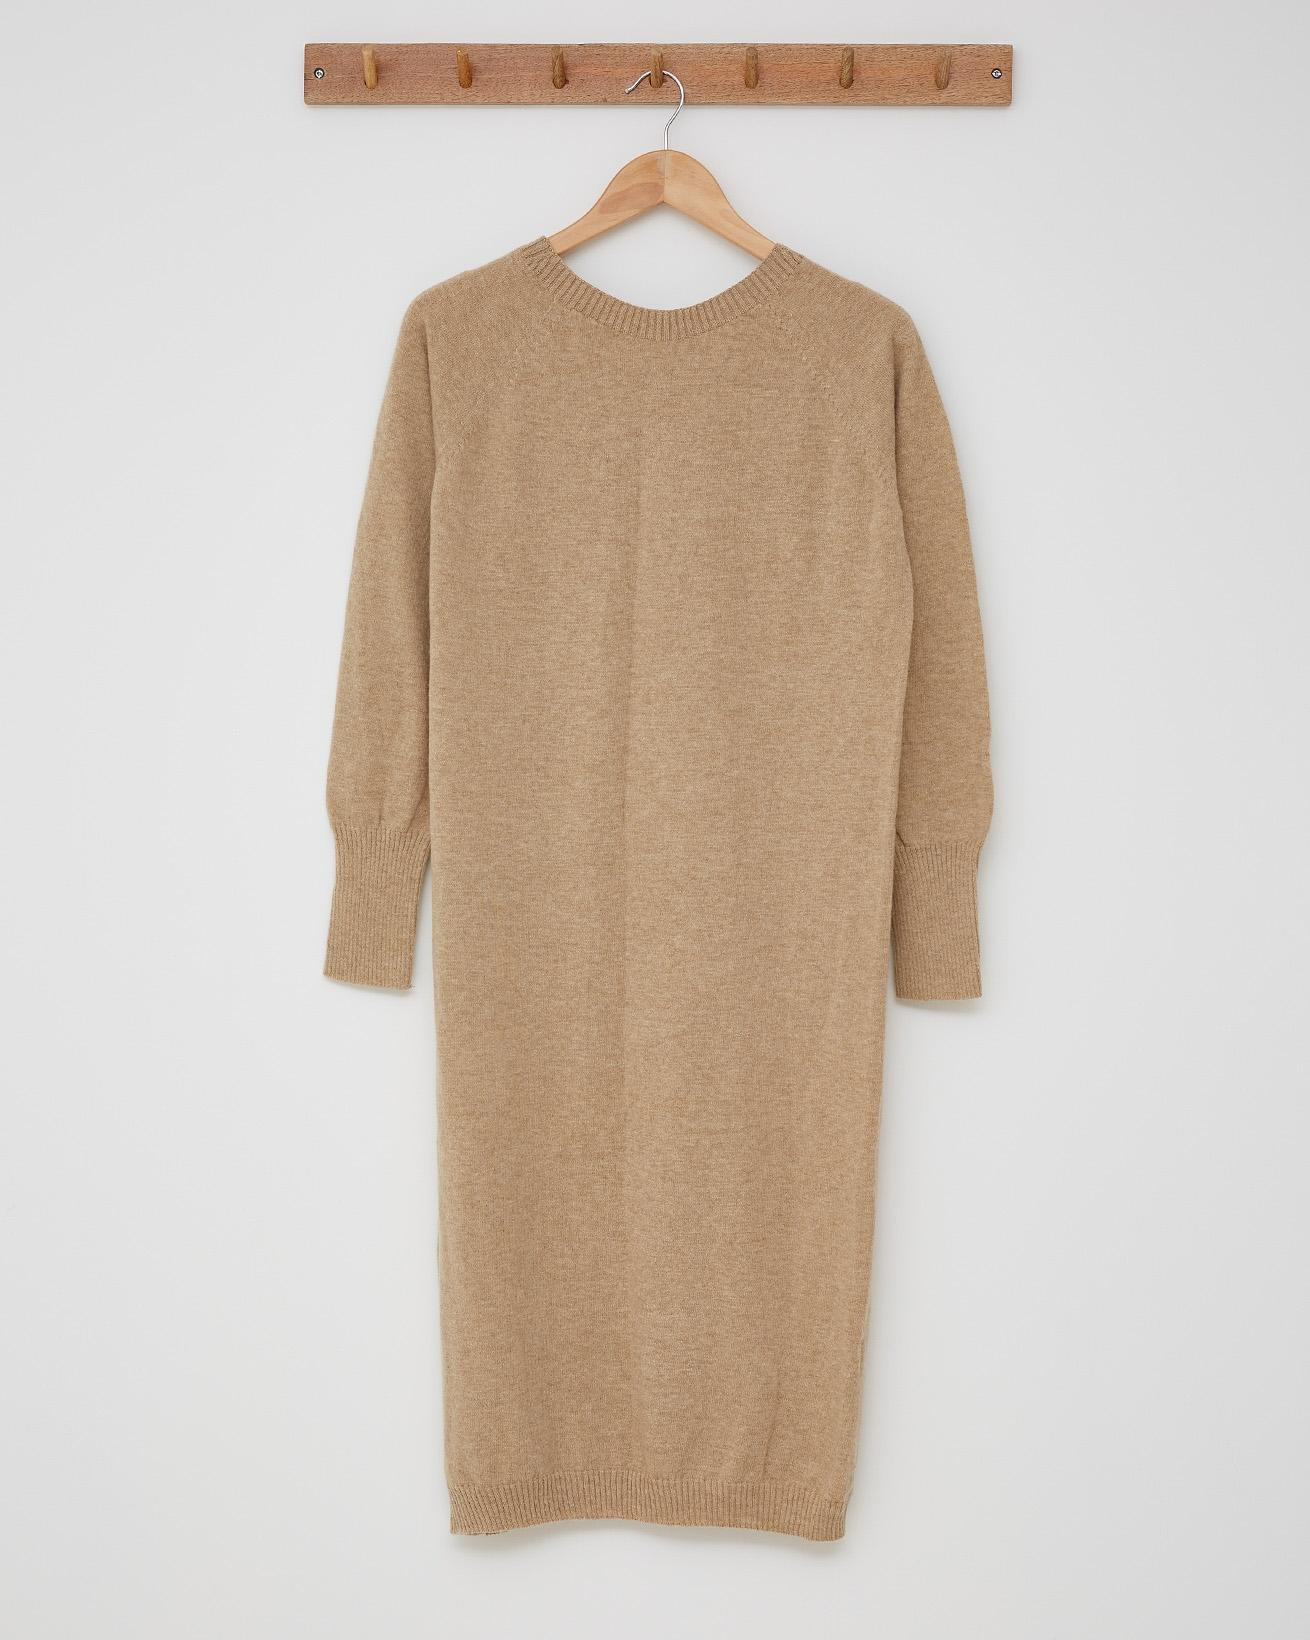 Supersoft Midi Dress - Size Small - Camel - 2469